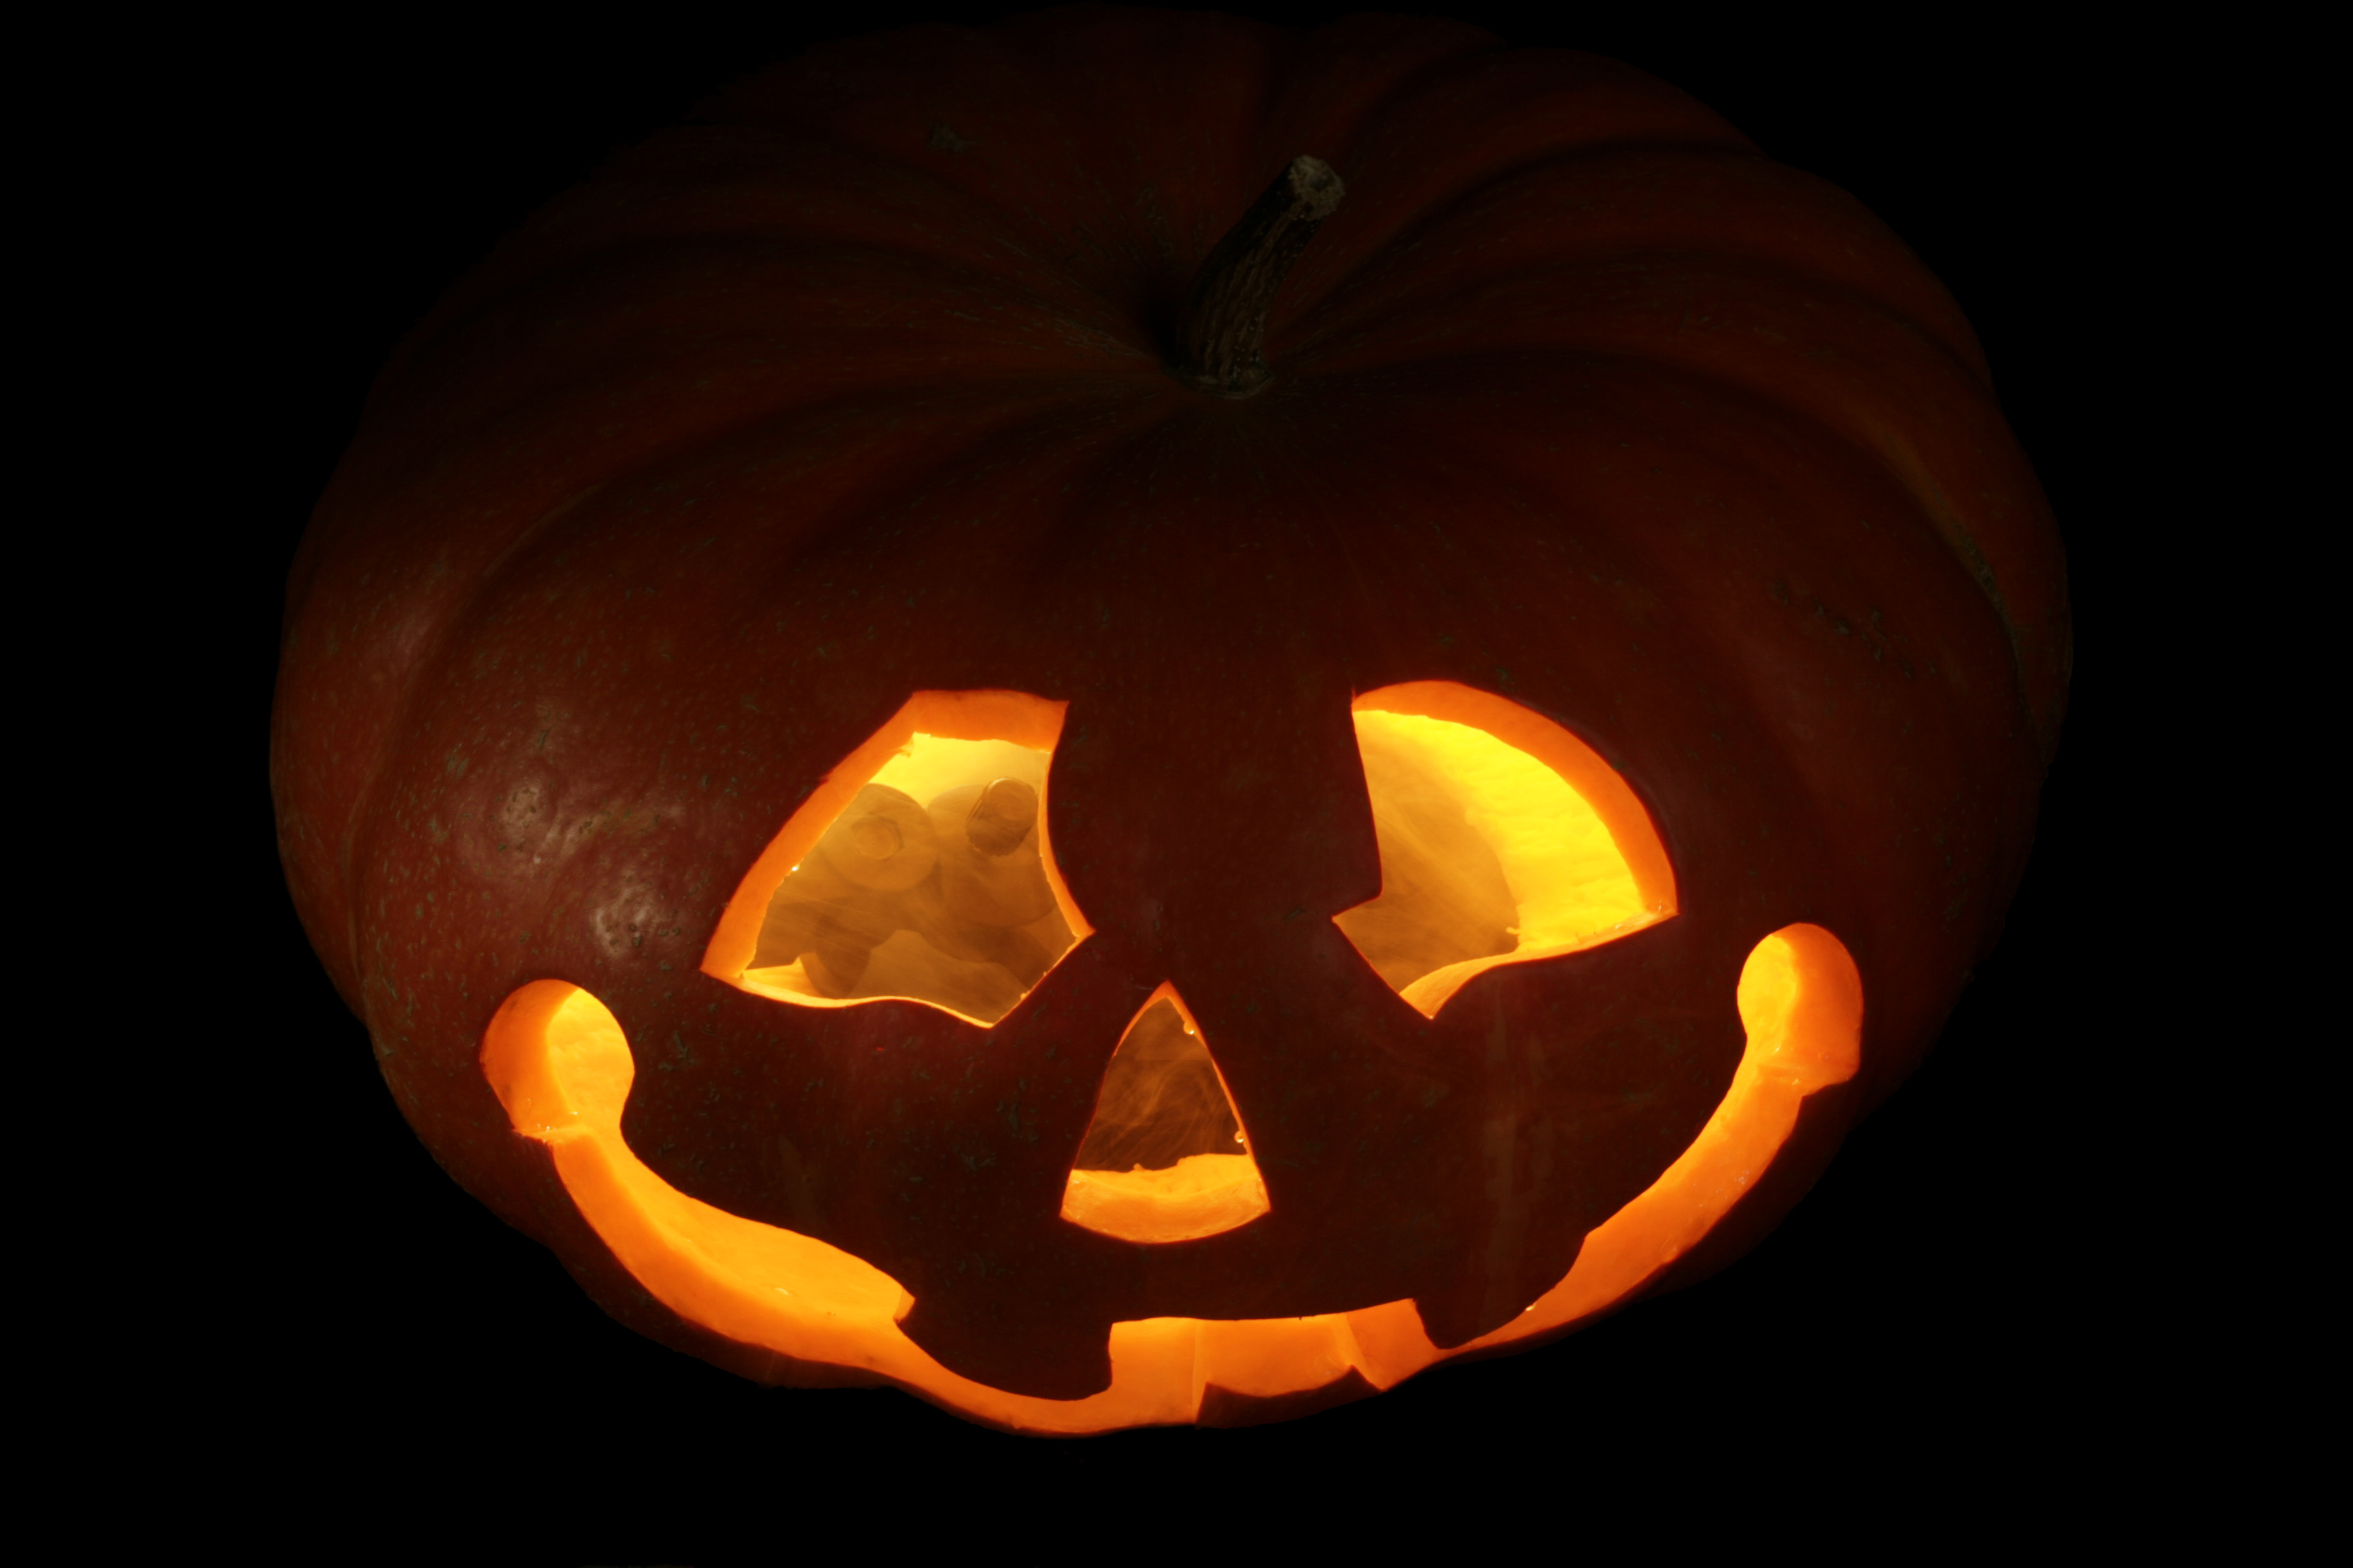 pumpkin, Autumn, Vegetable, Traditional, Spooky, HQ Photo